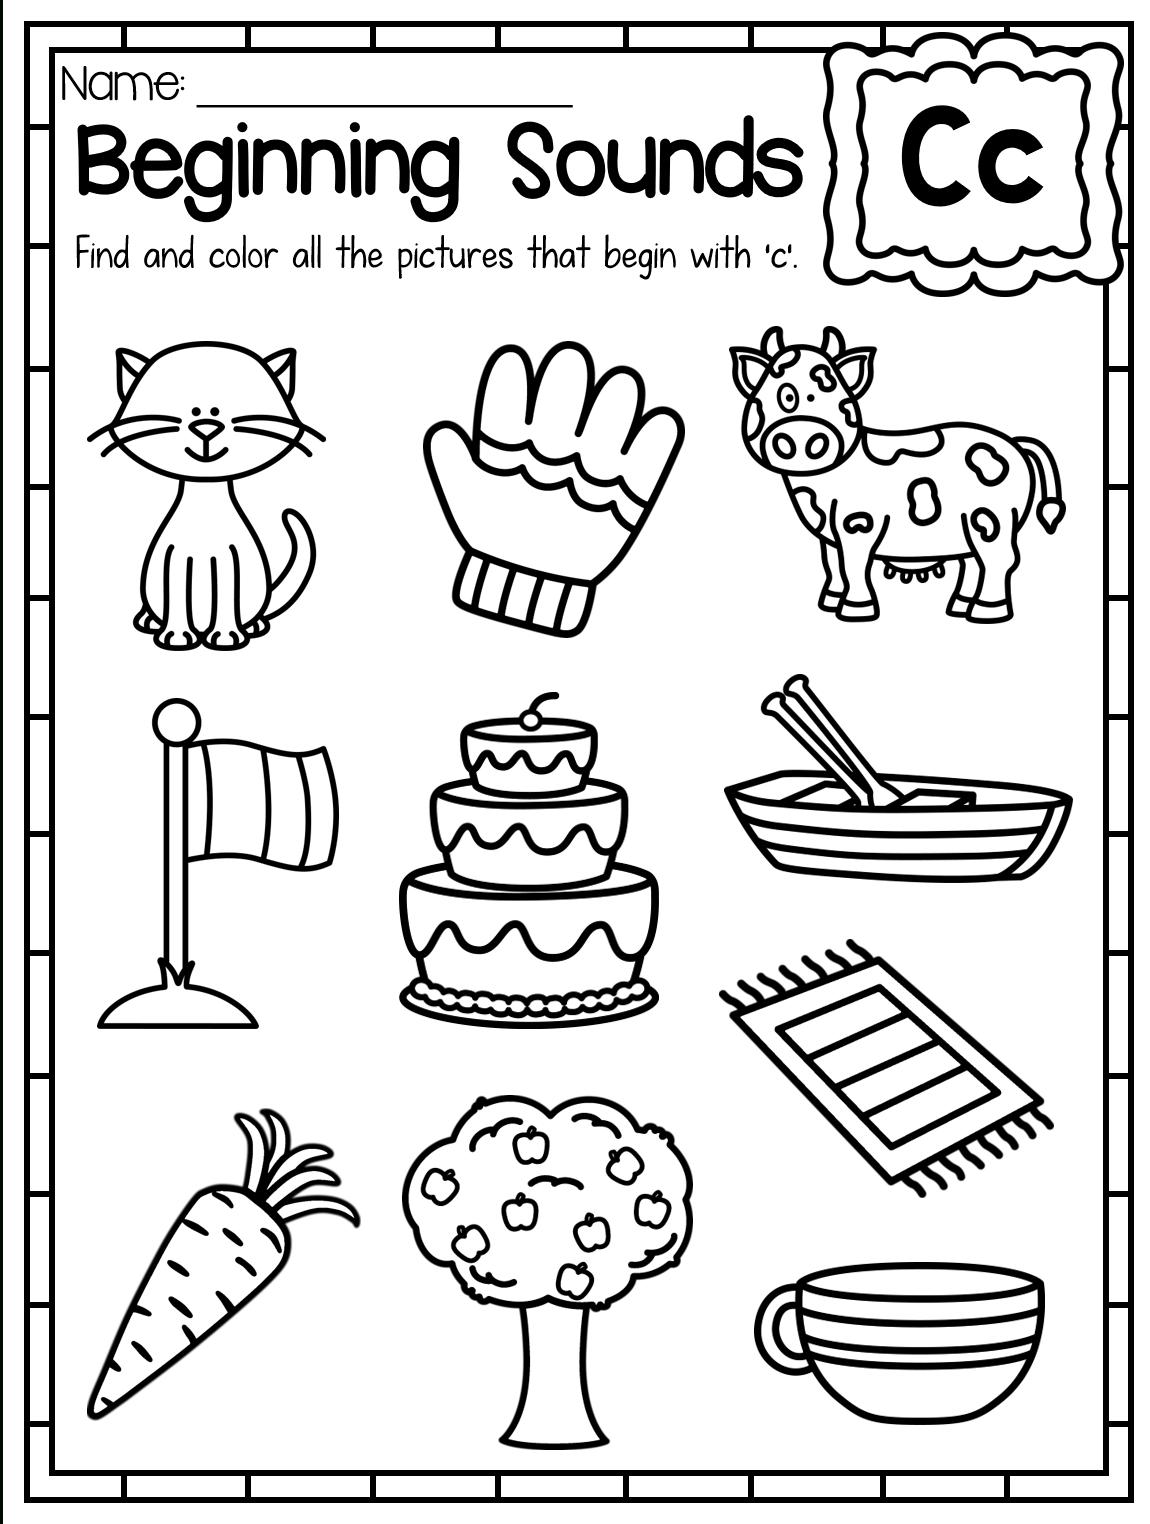 Beginning Sounds Worksheet. Letter C. These Beginning Sounds